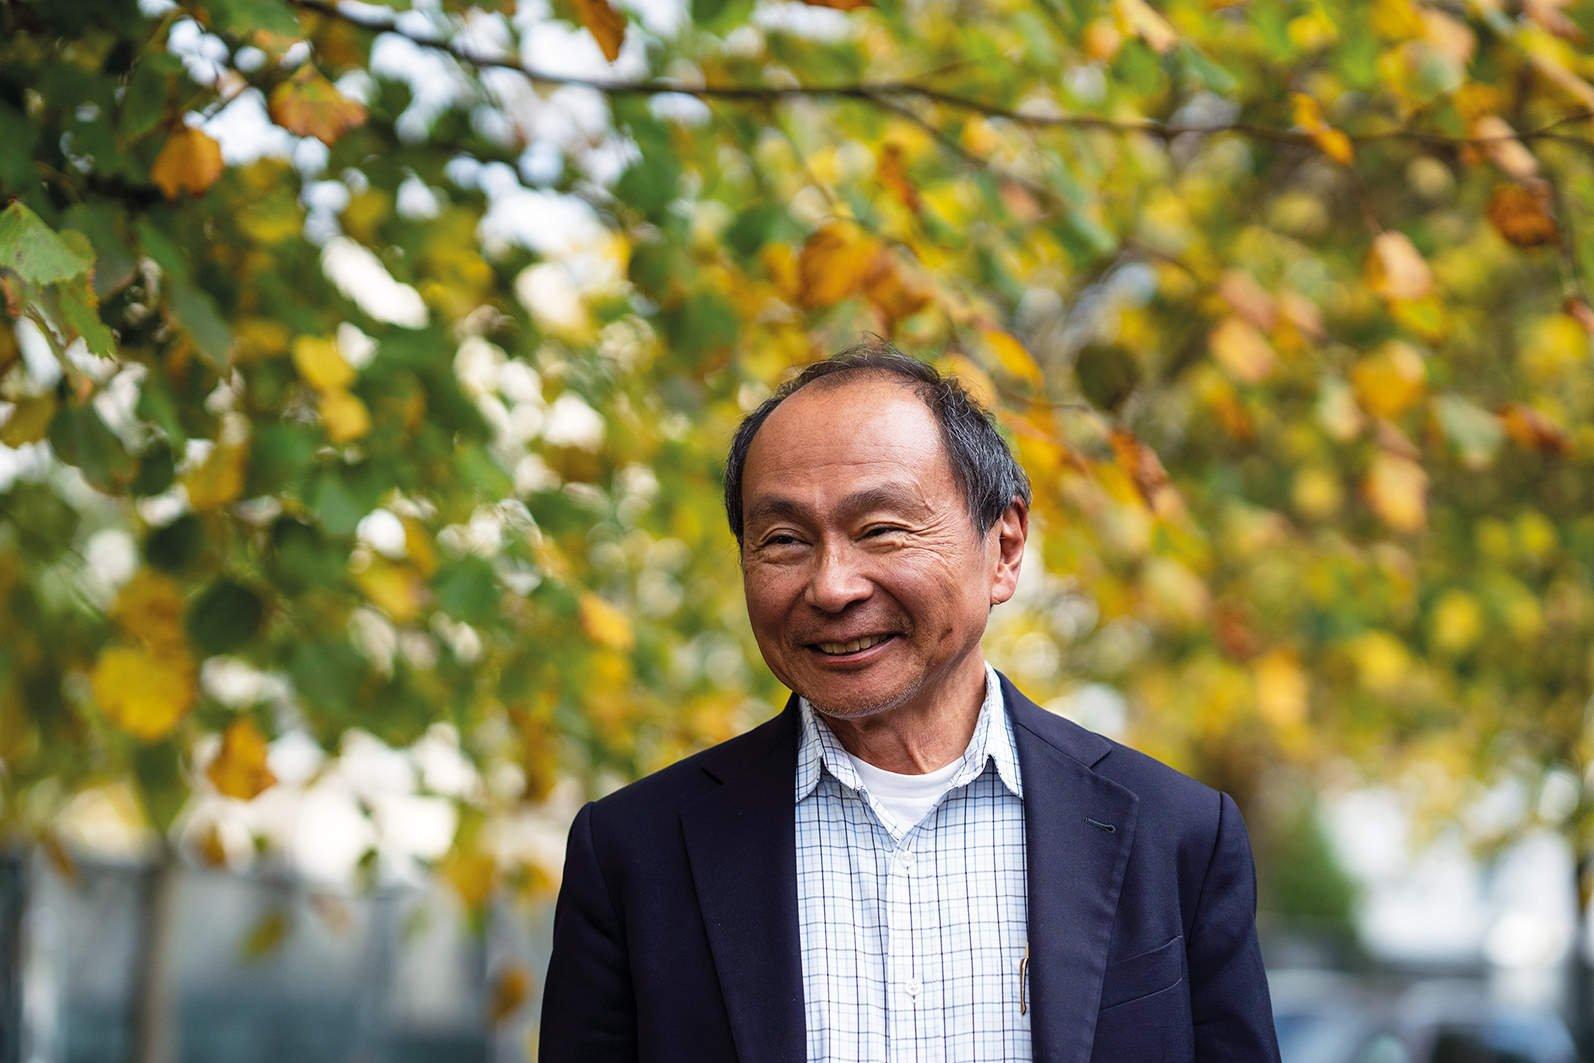 Френсис Фукујама (Фото: David Levenson/Getty Images)